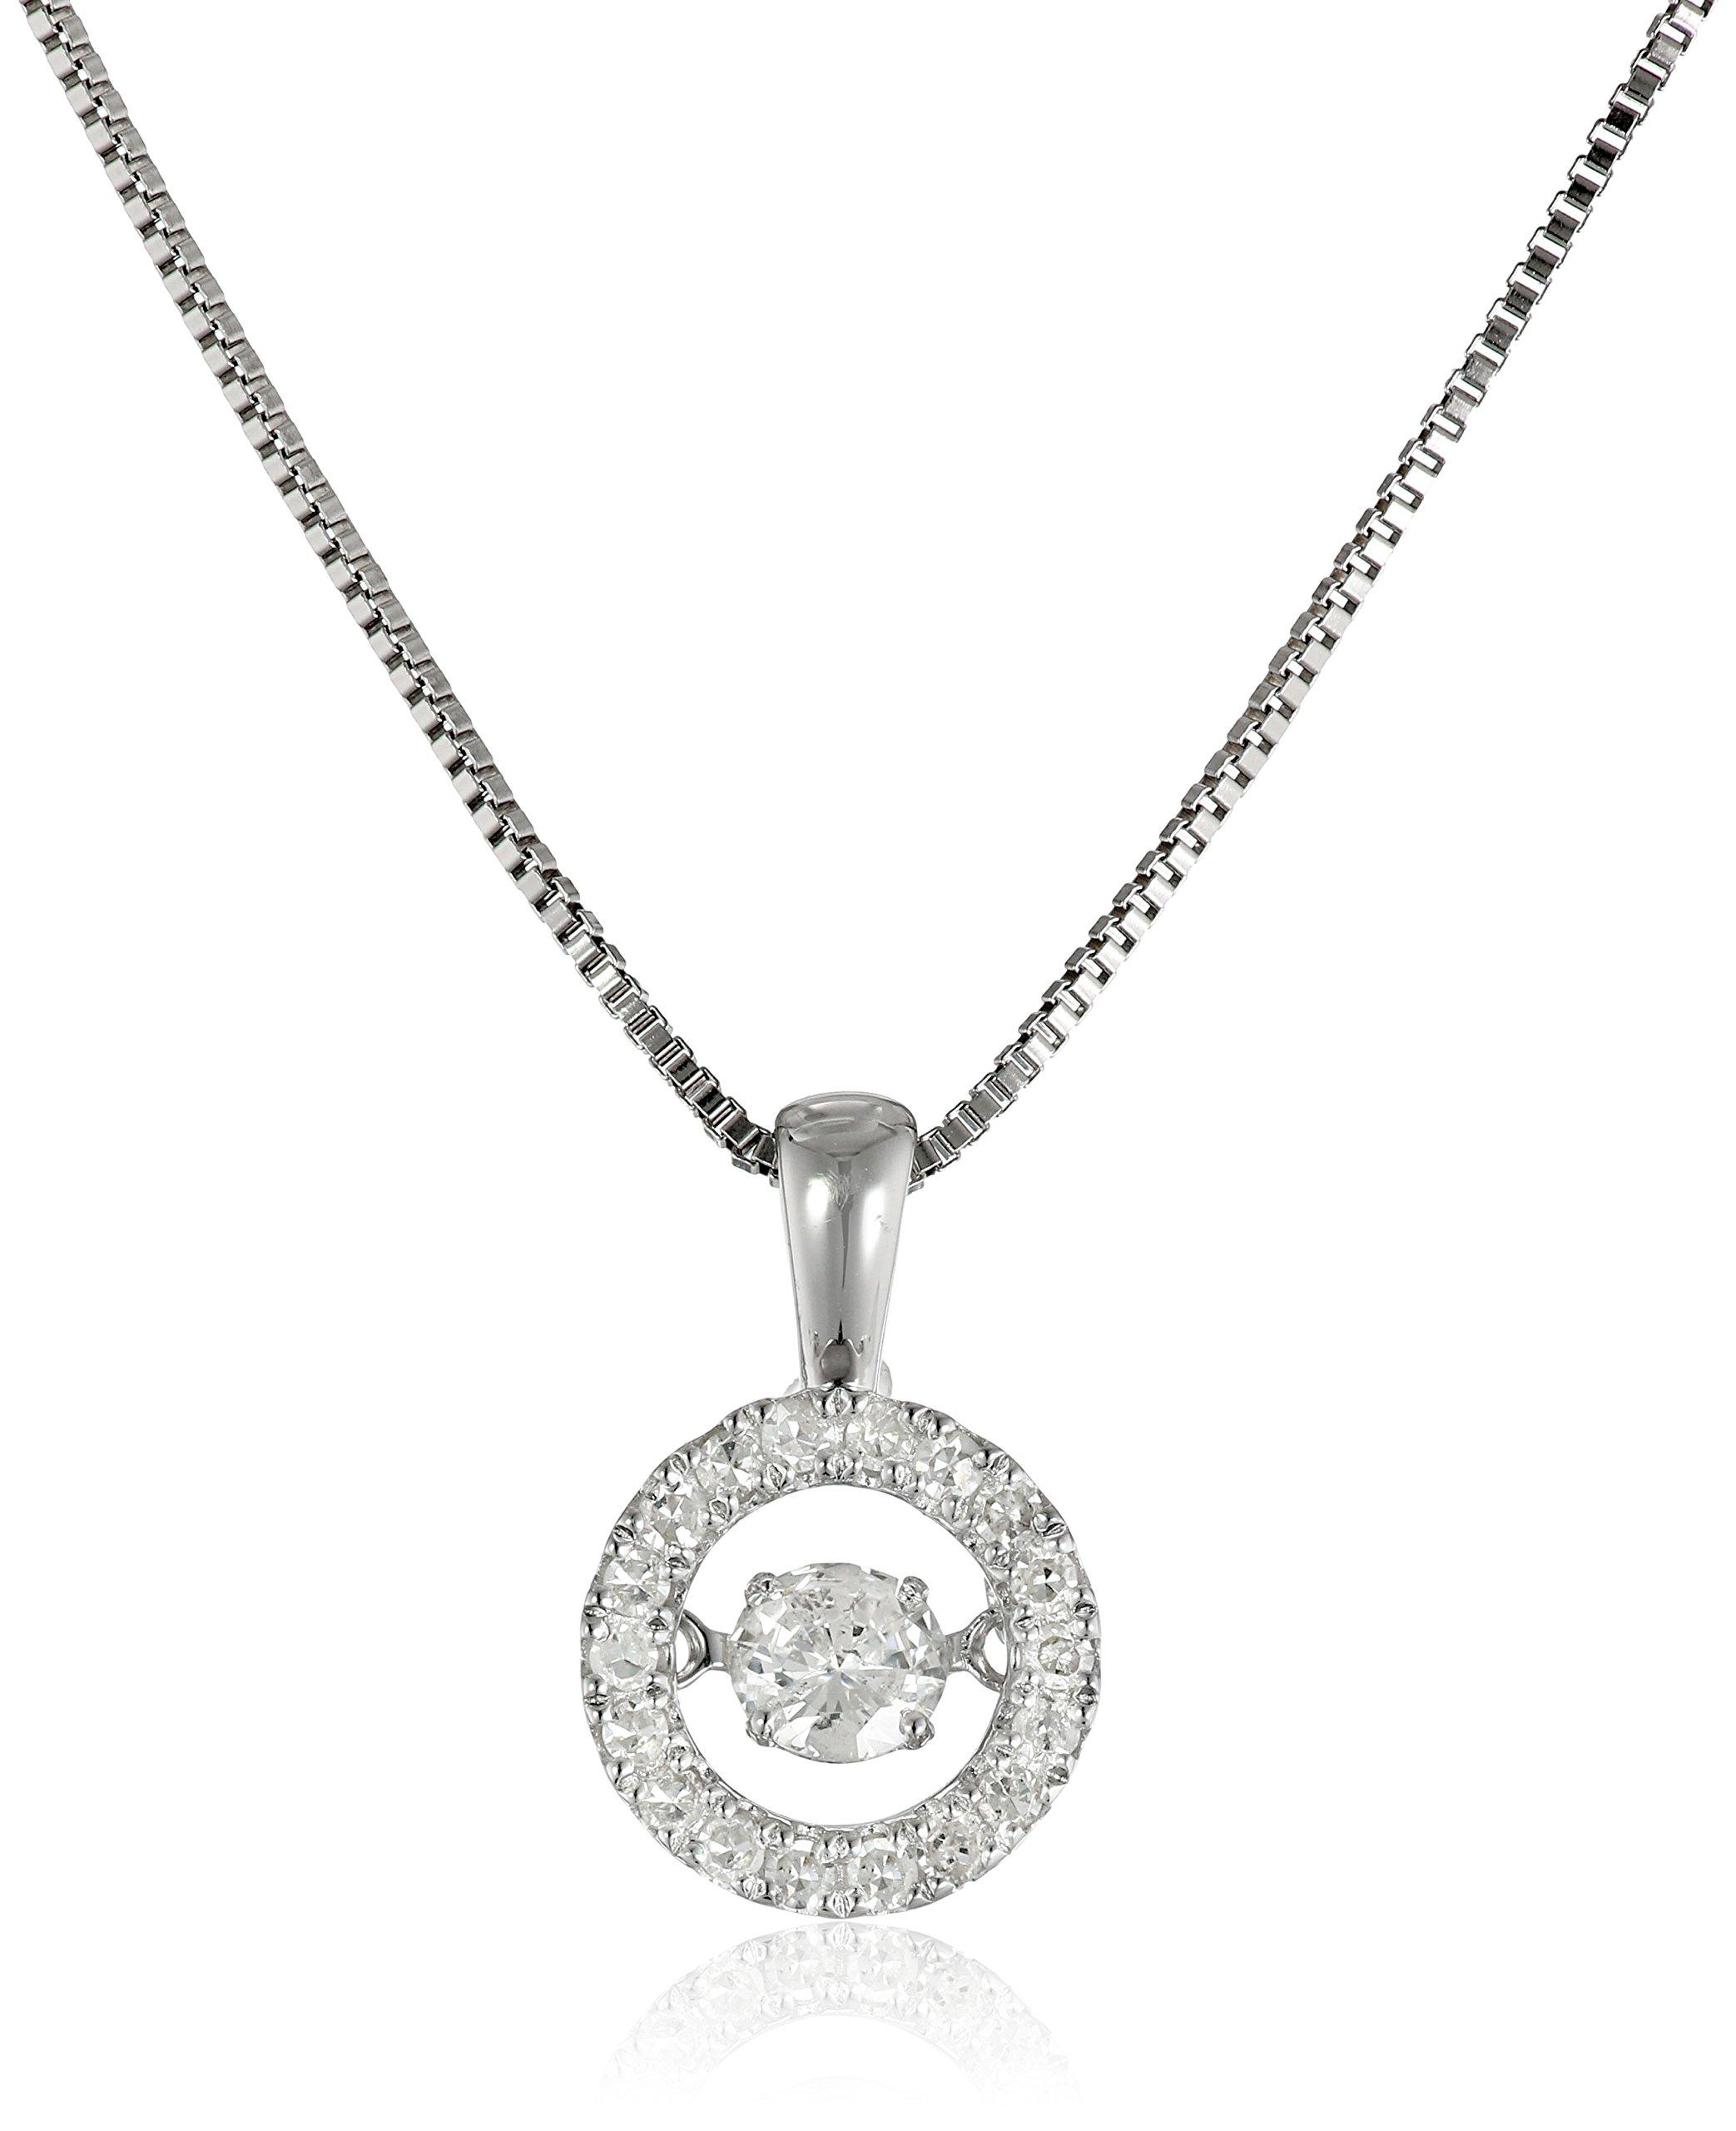 Dancing Diamond Circle Pendant Necklace (1/3cttw, I-J Color, I2-I3 Clarity), 18'' + 2'' extender